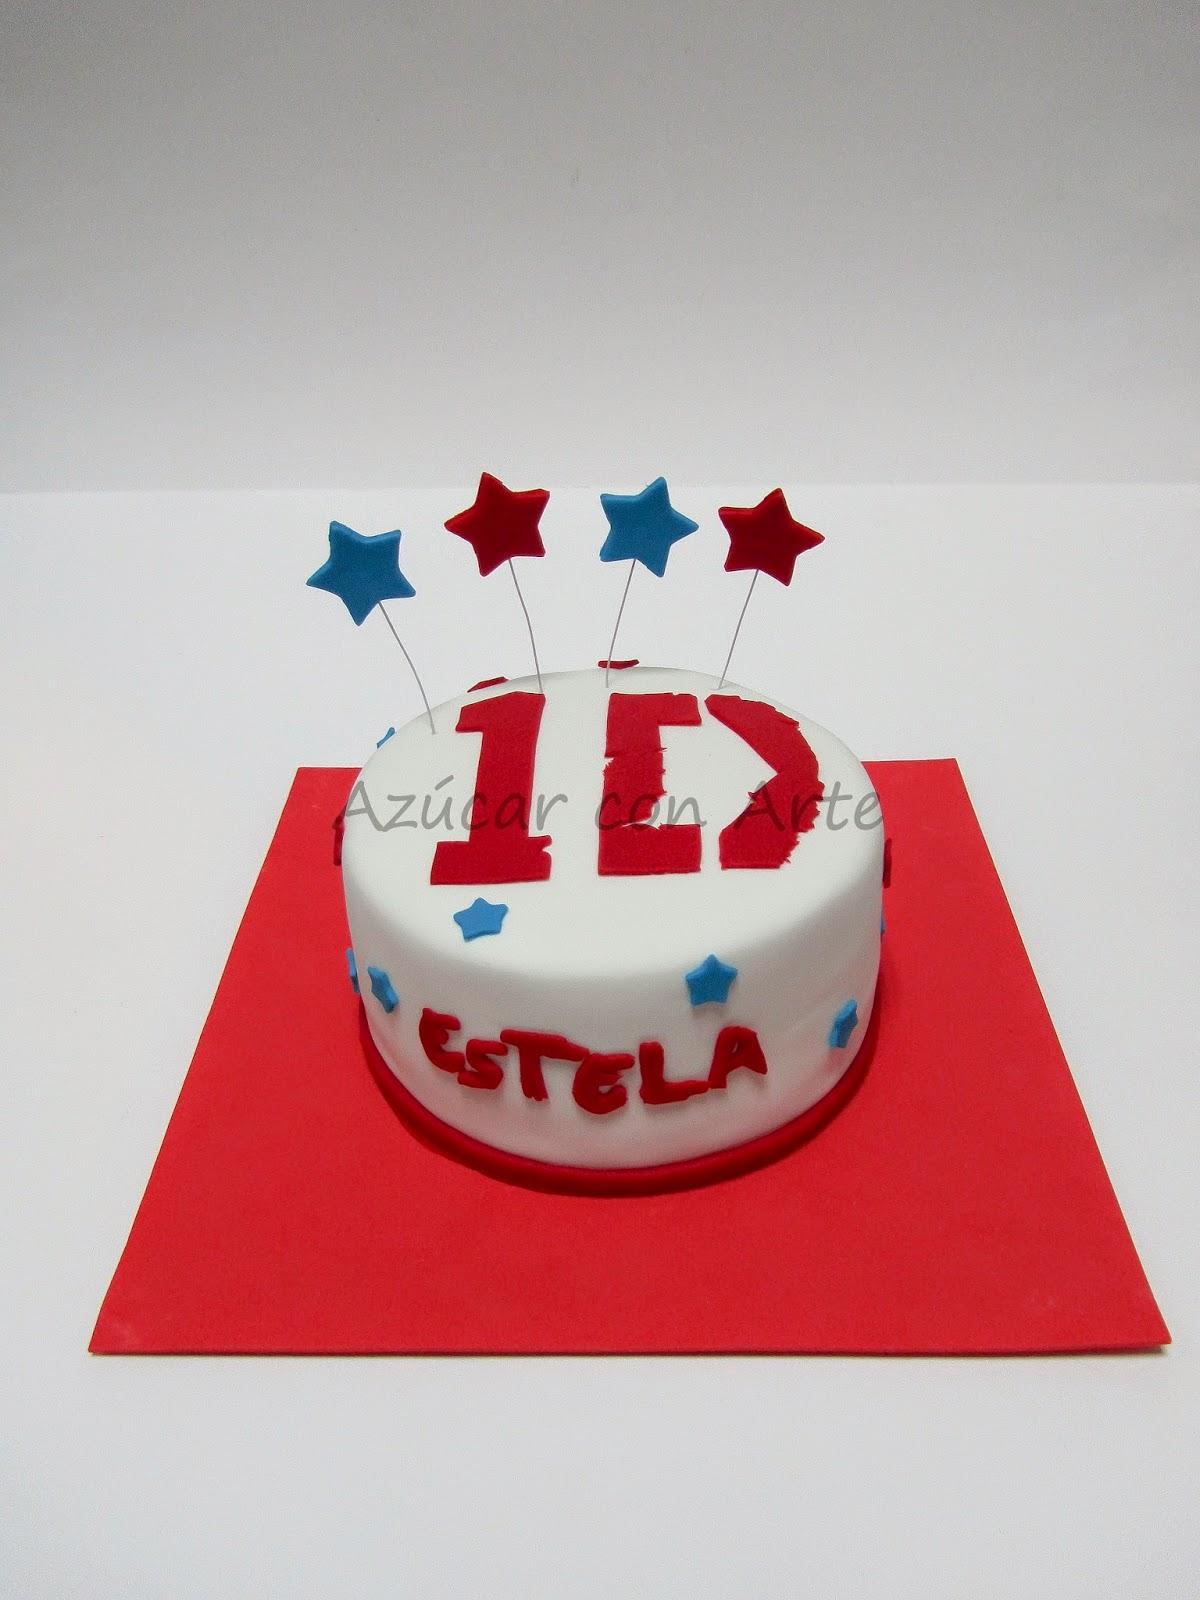 one direction cake, tarta sin gluten, gluten free cake | azucar con arte